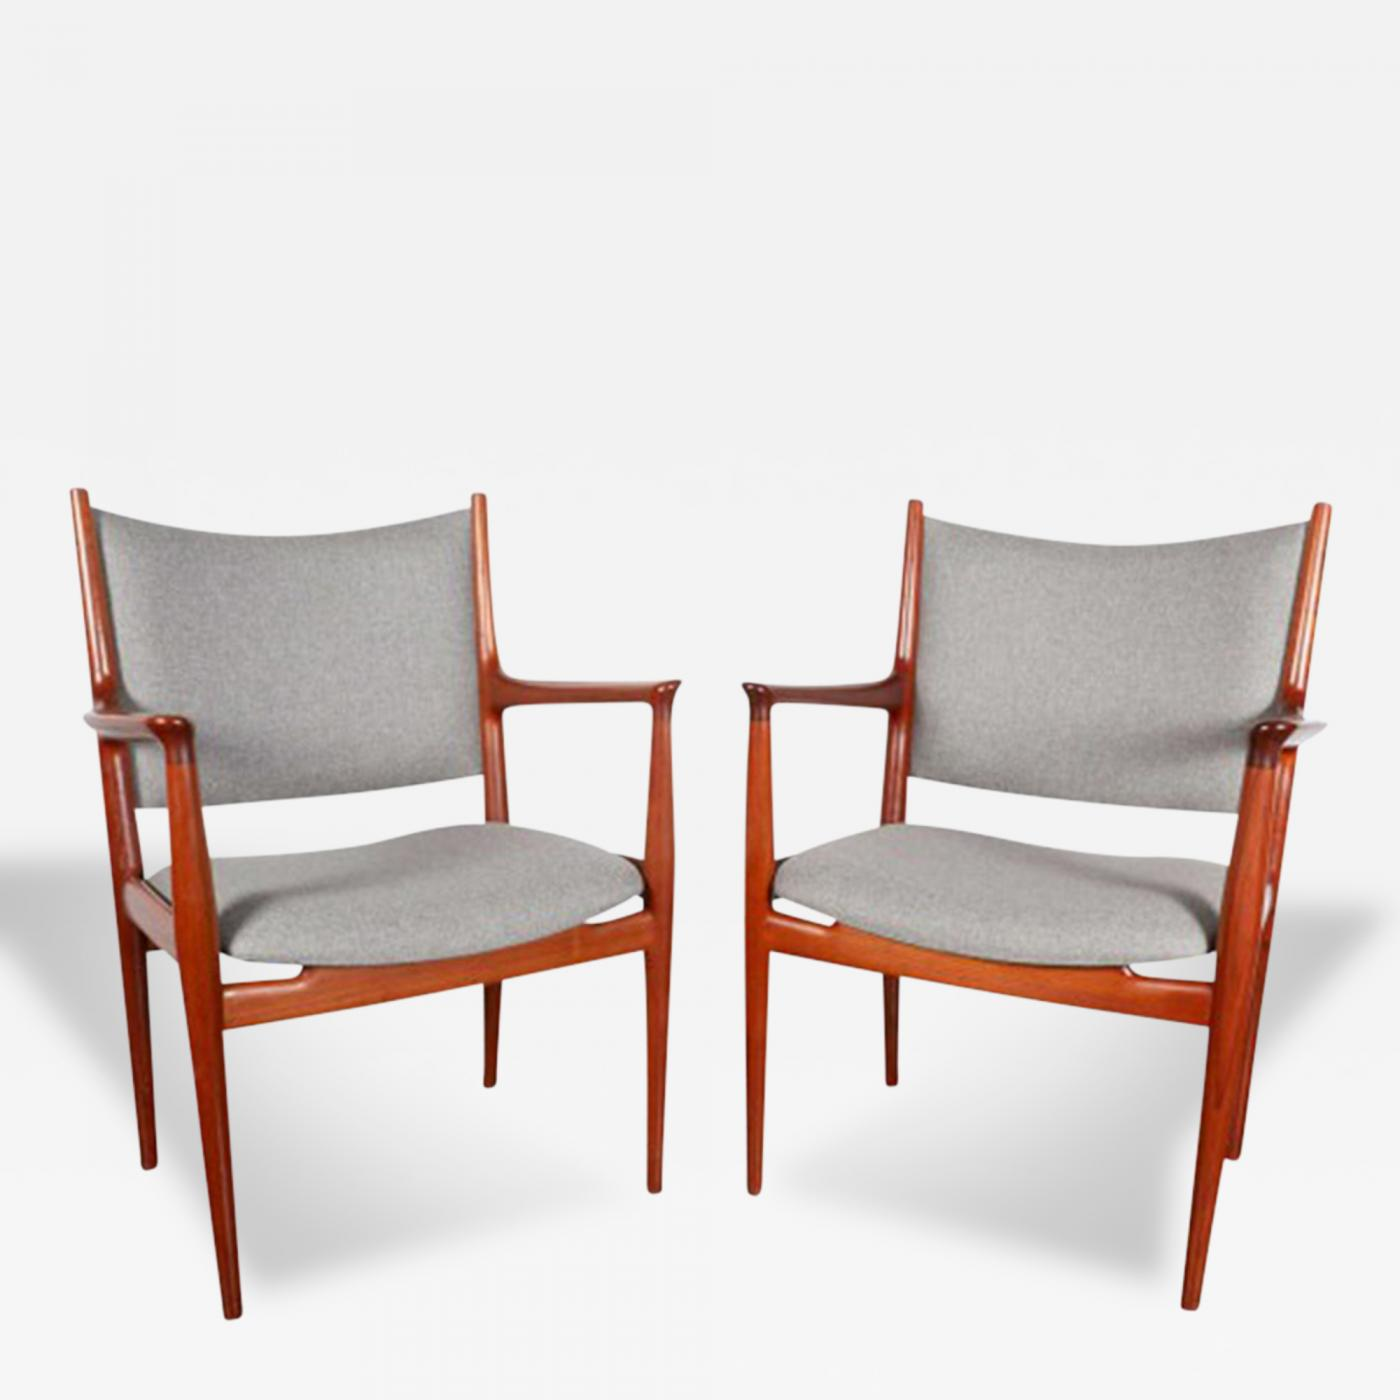 Hans J Wegner Hans Wegner JH 513 Cashmere and Teak Arm Chairs